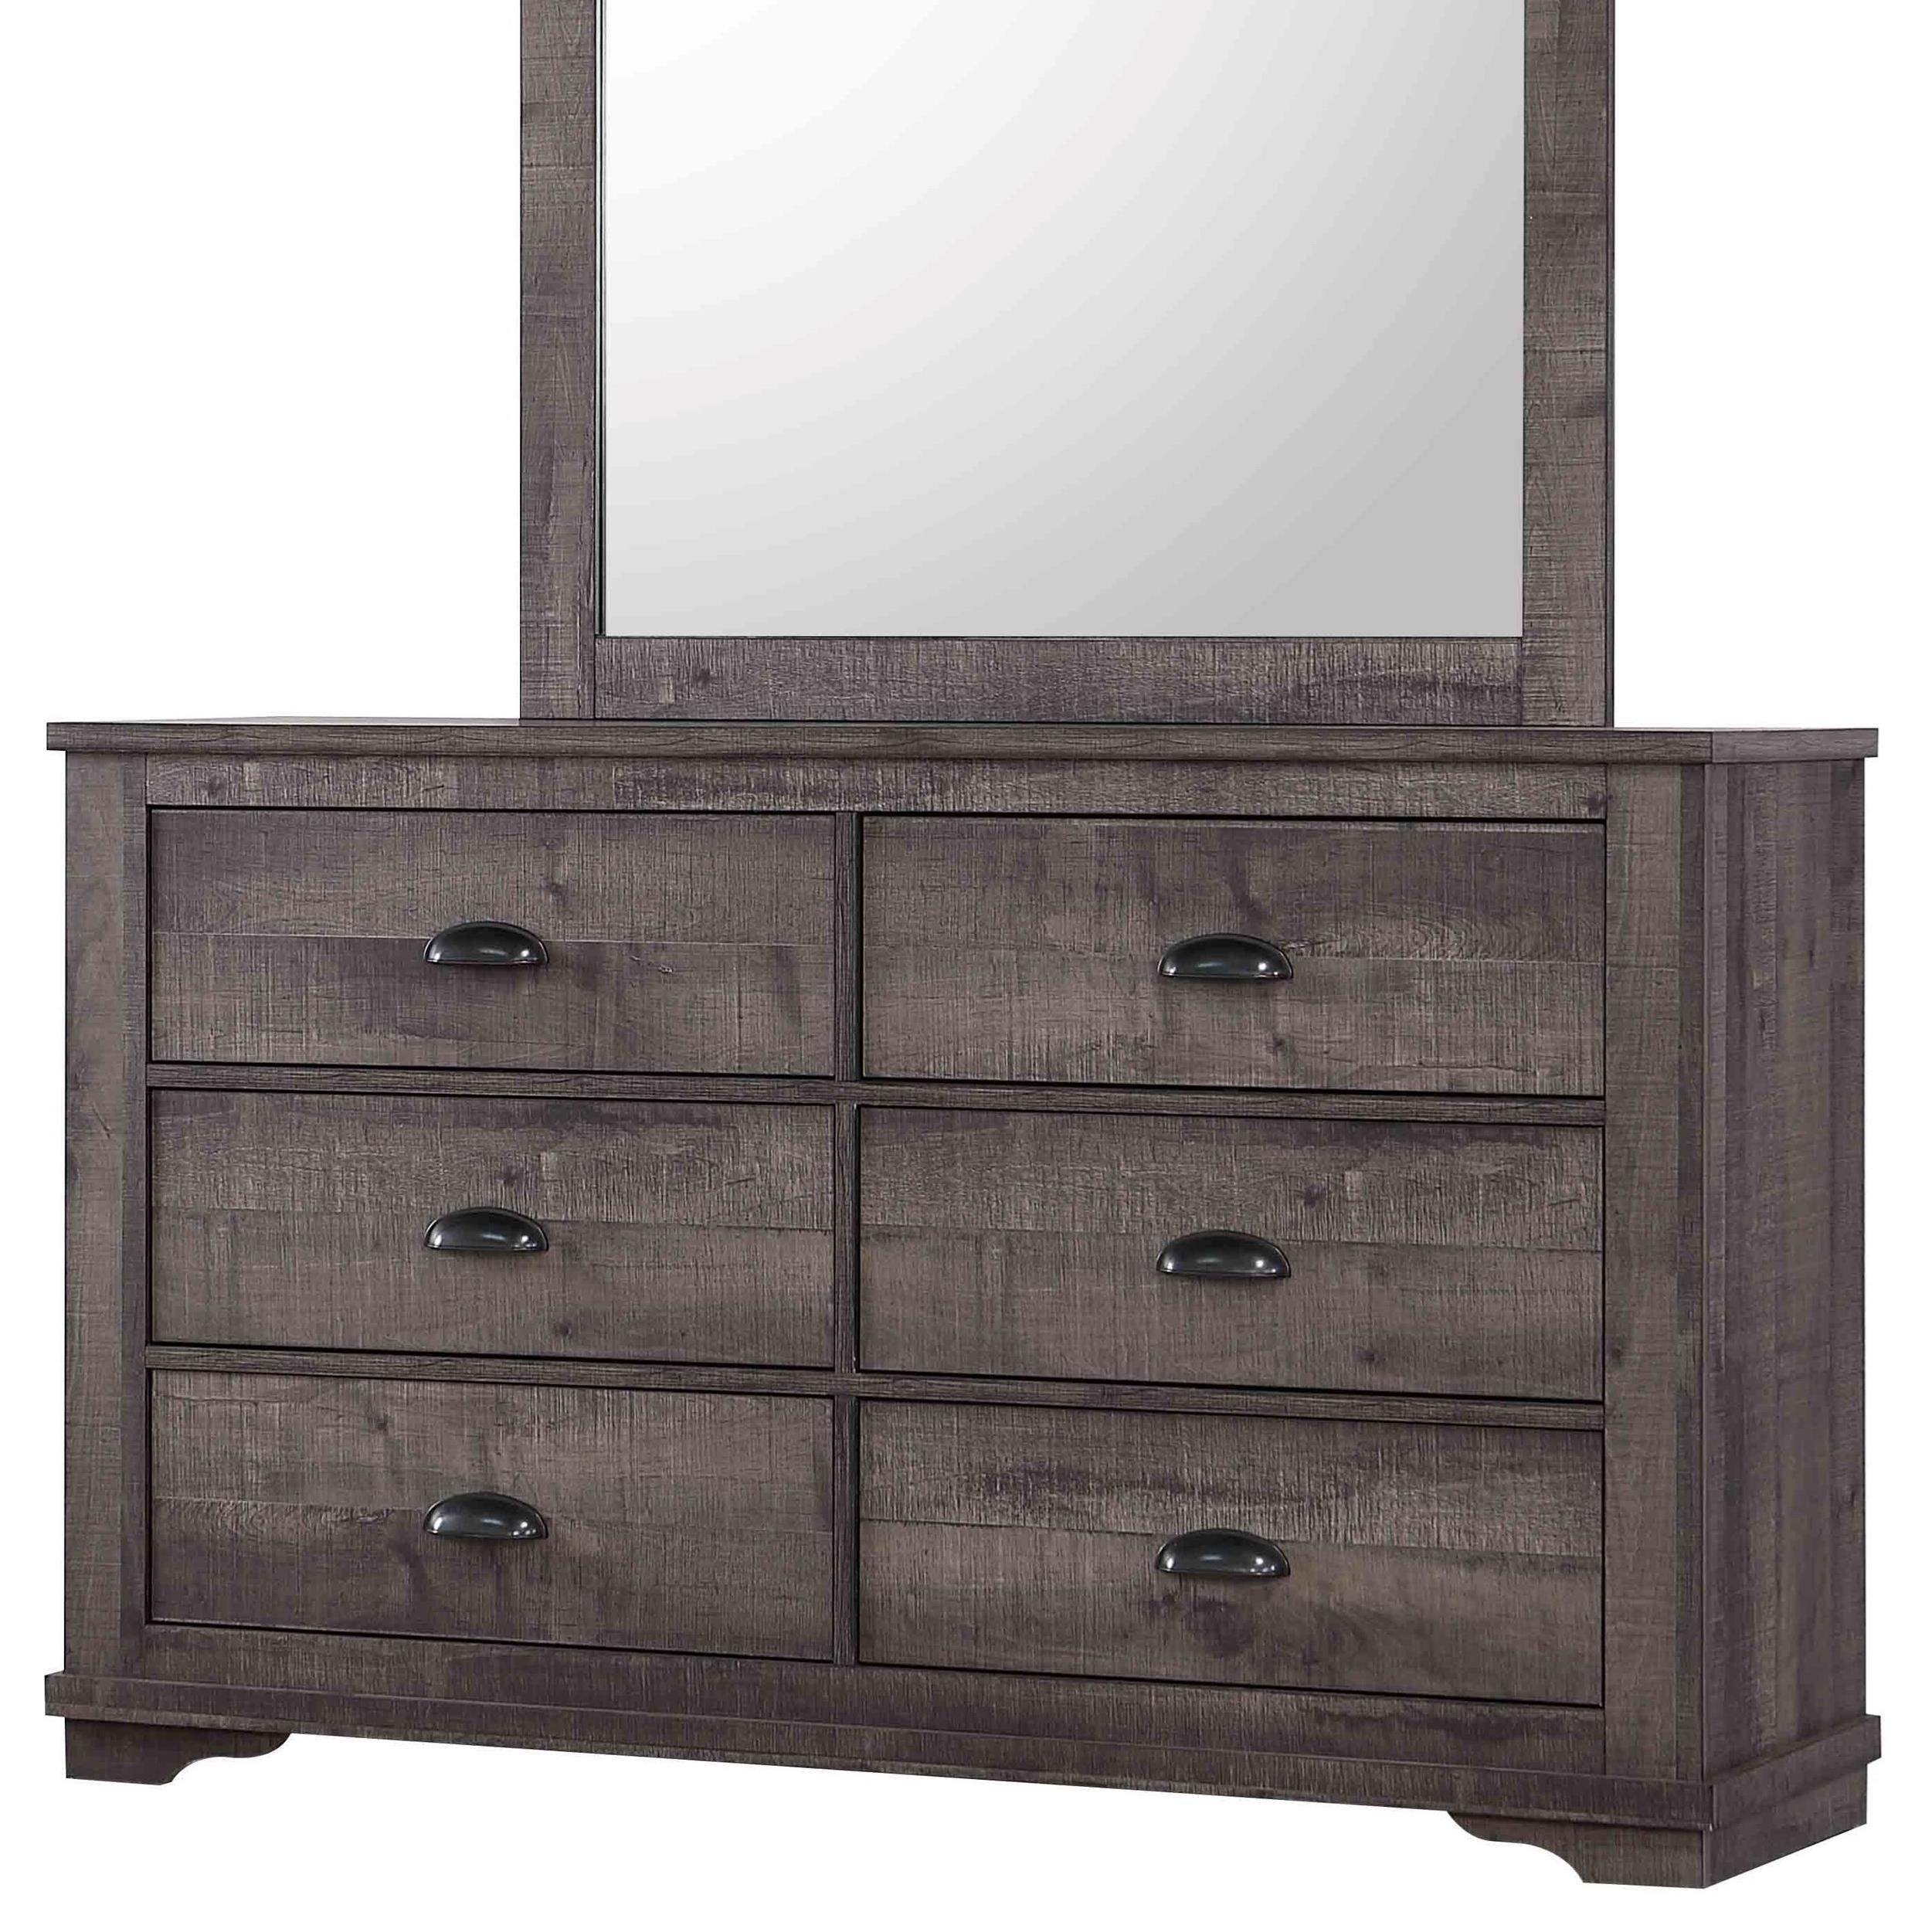 Transitional 6-Drawer Dresser